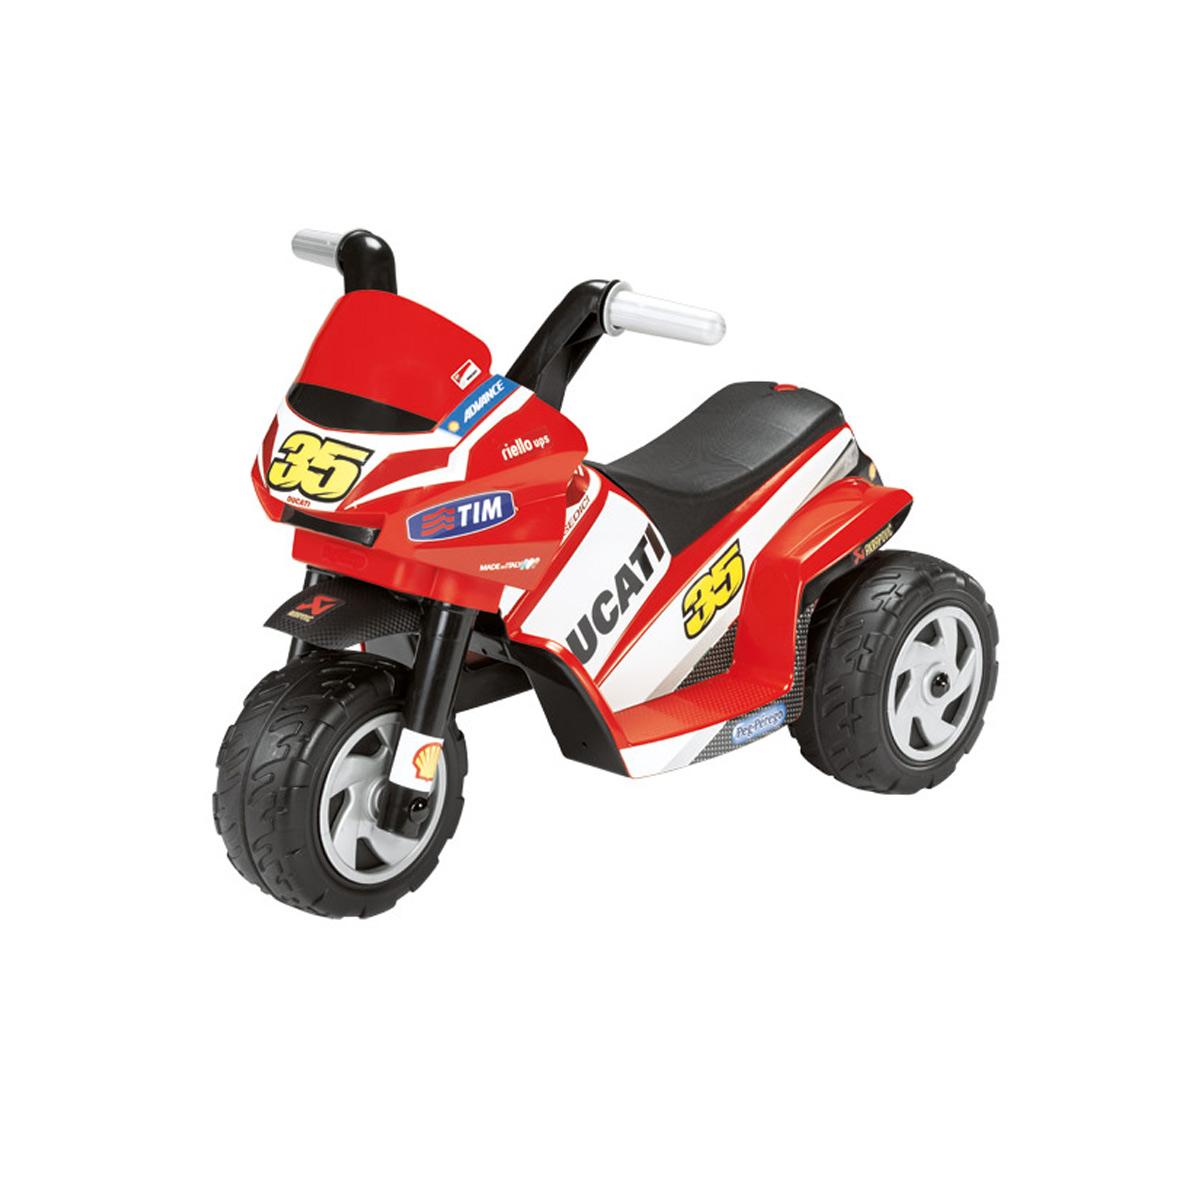 moto electrique garcon 2 ans